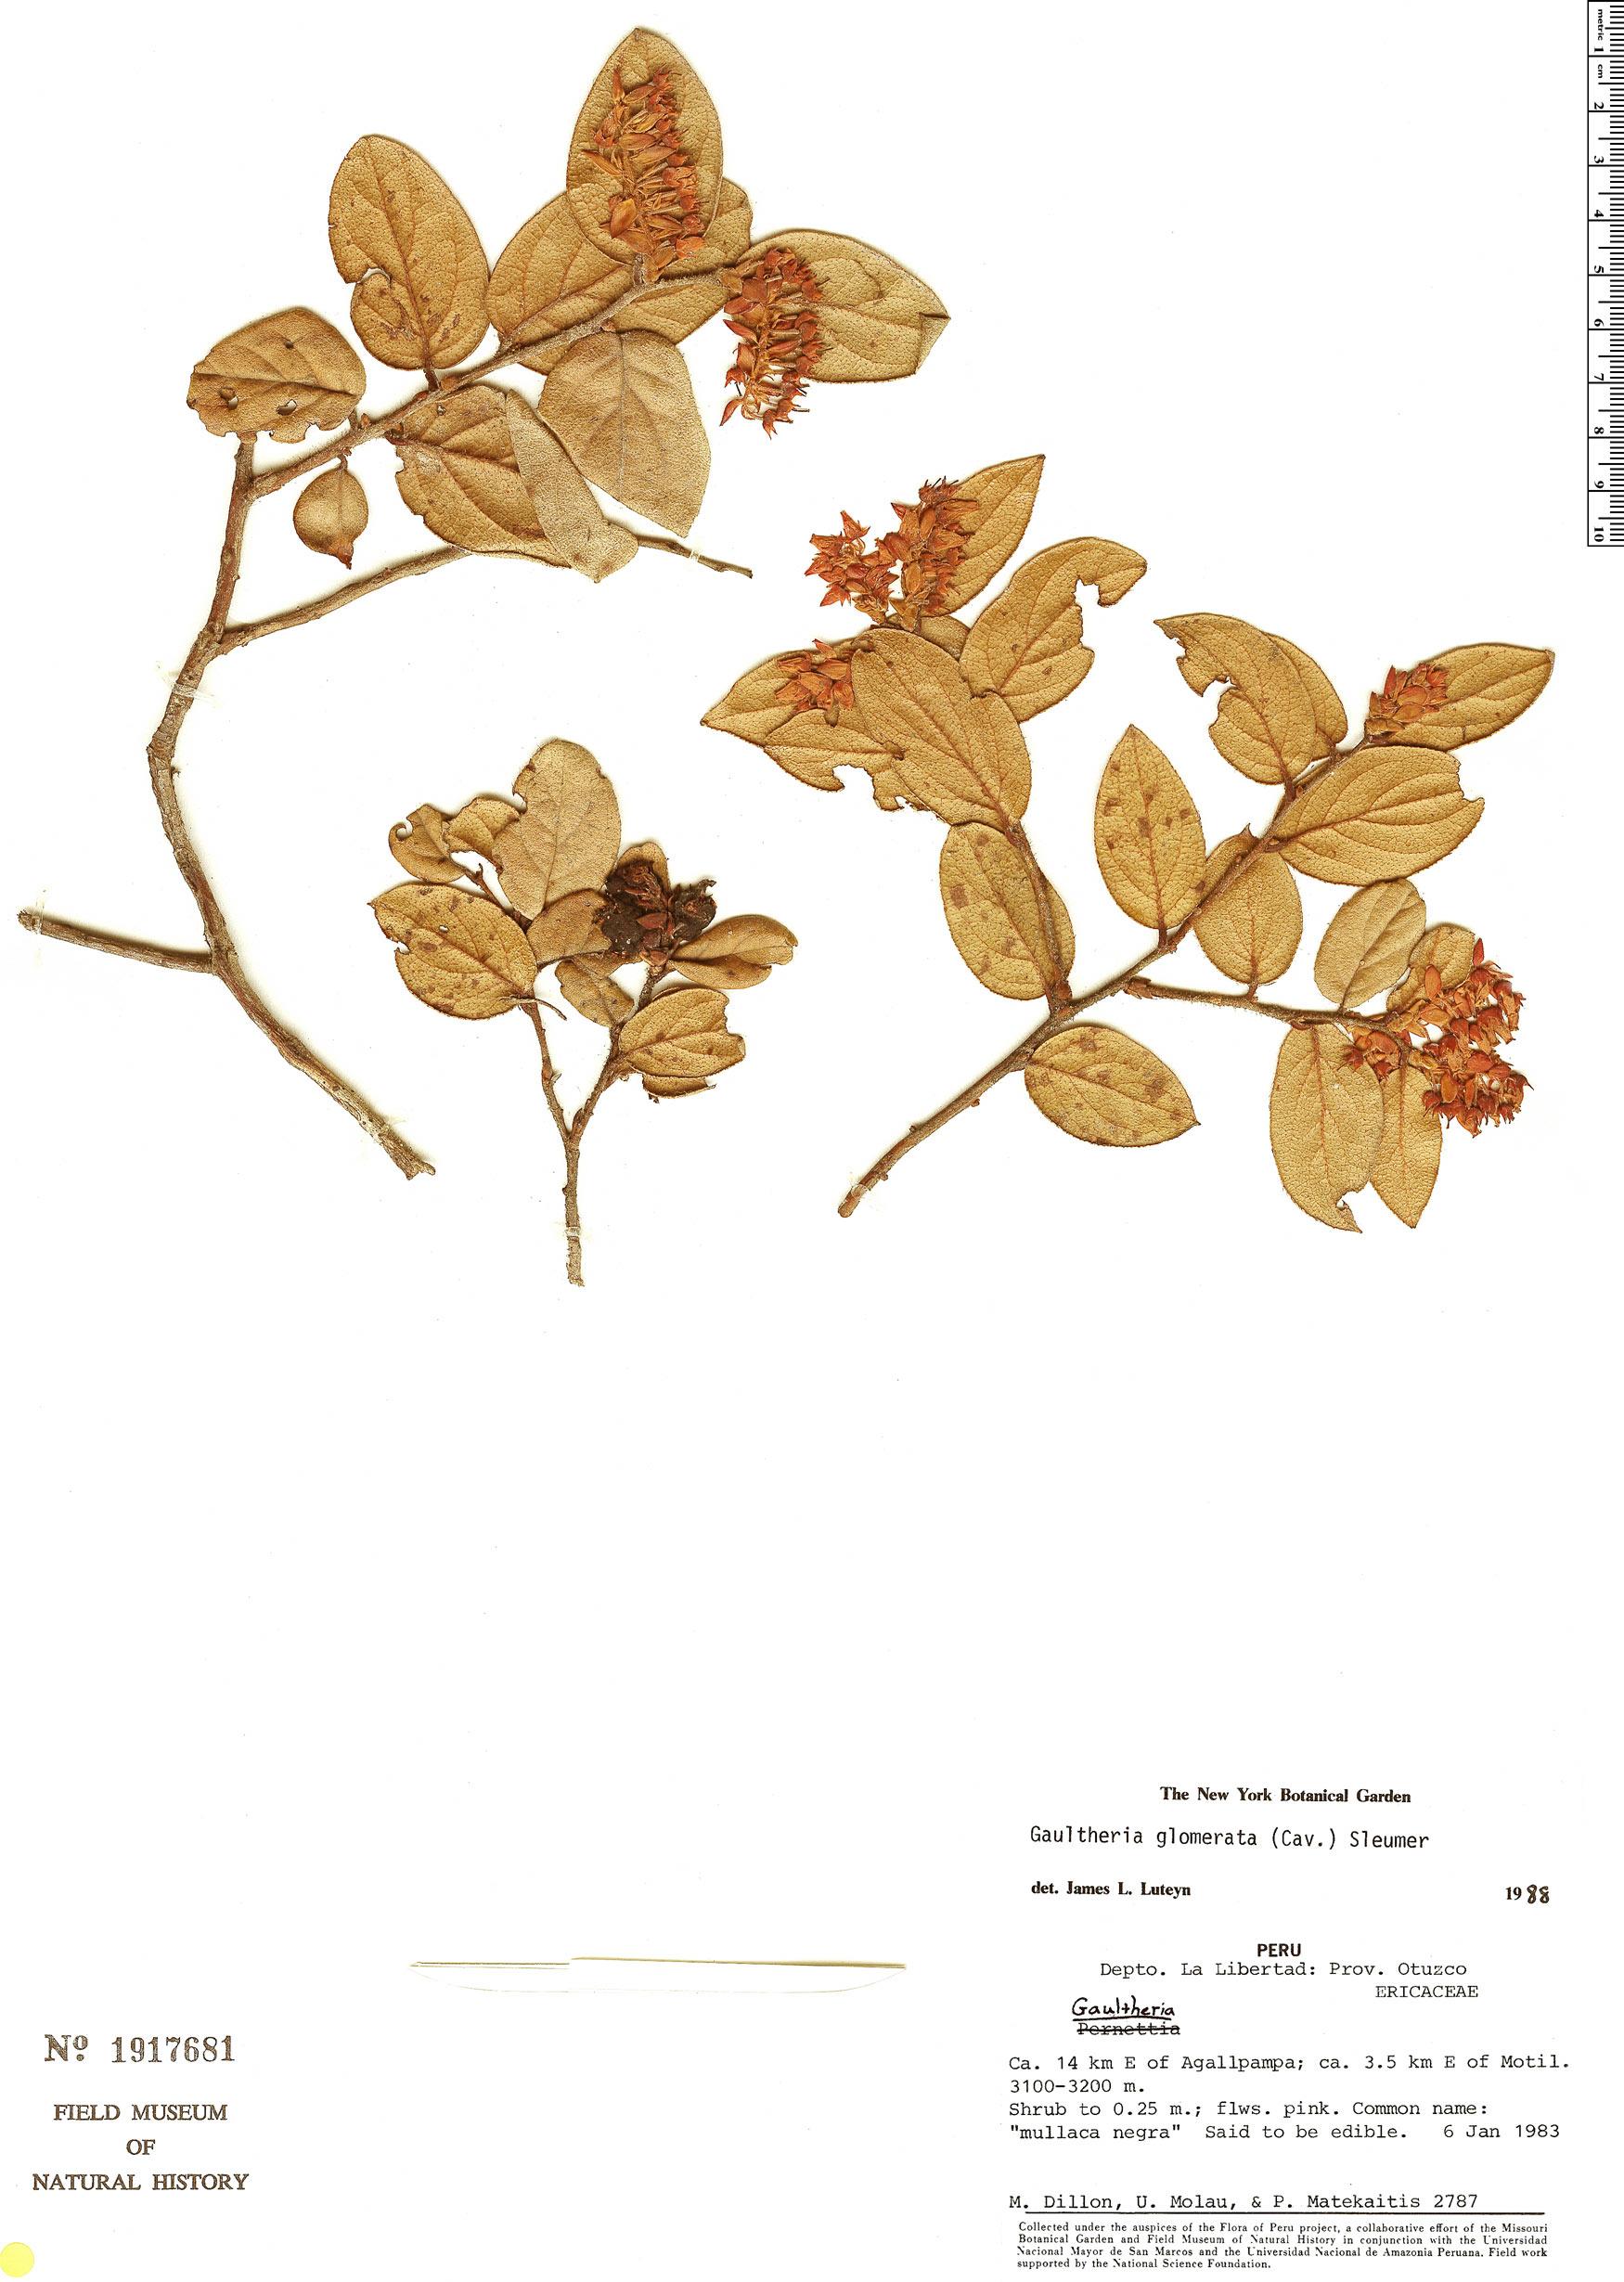 Specimen: Gaultheria glomerata